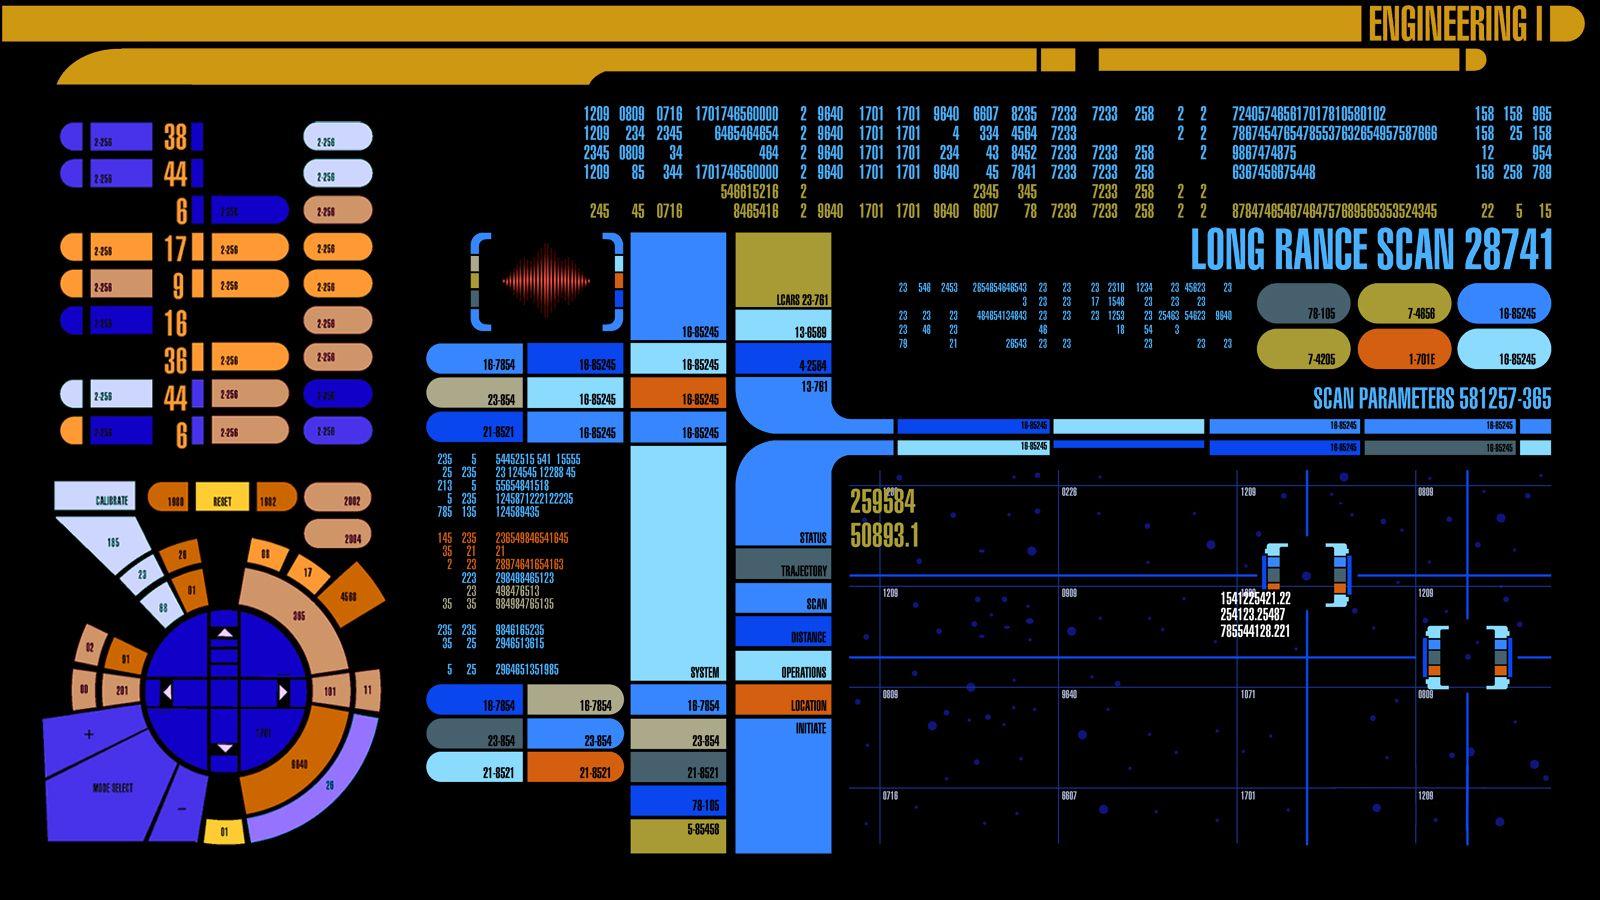 Star Trek computer wallpaper Star trek wallpaper, Star